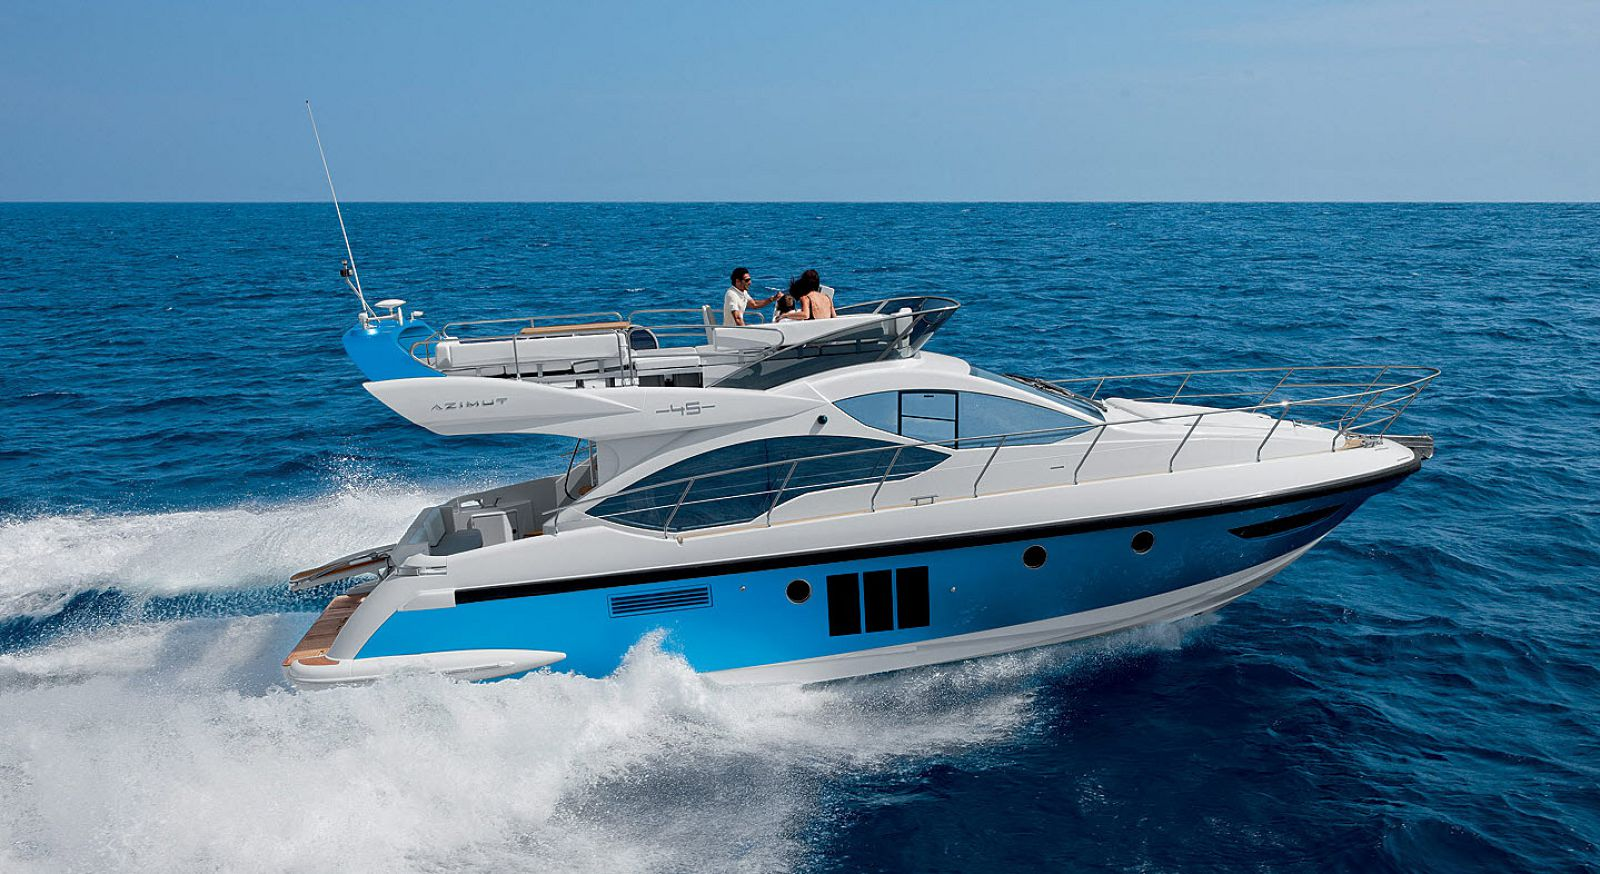 azimut 45 flybridge yacht for sale